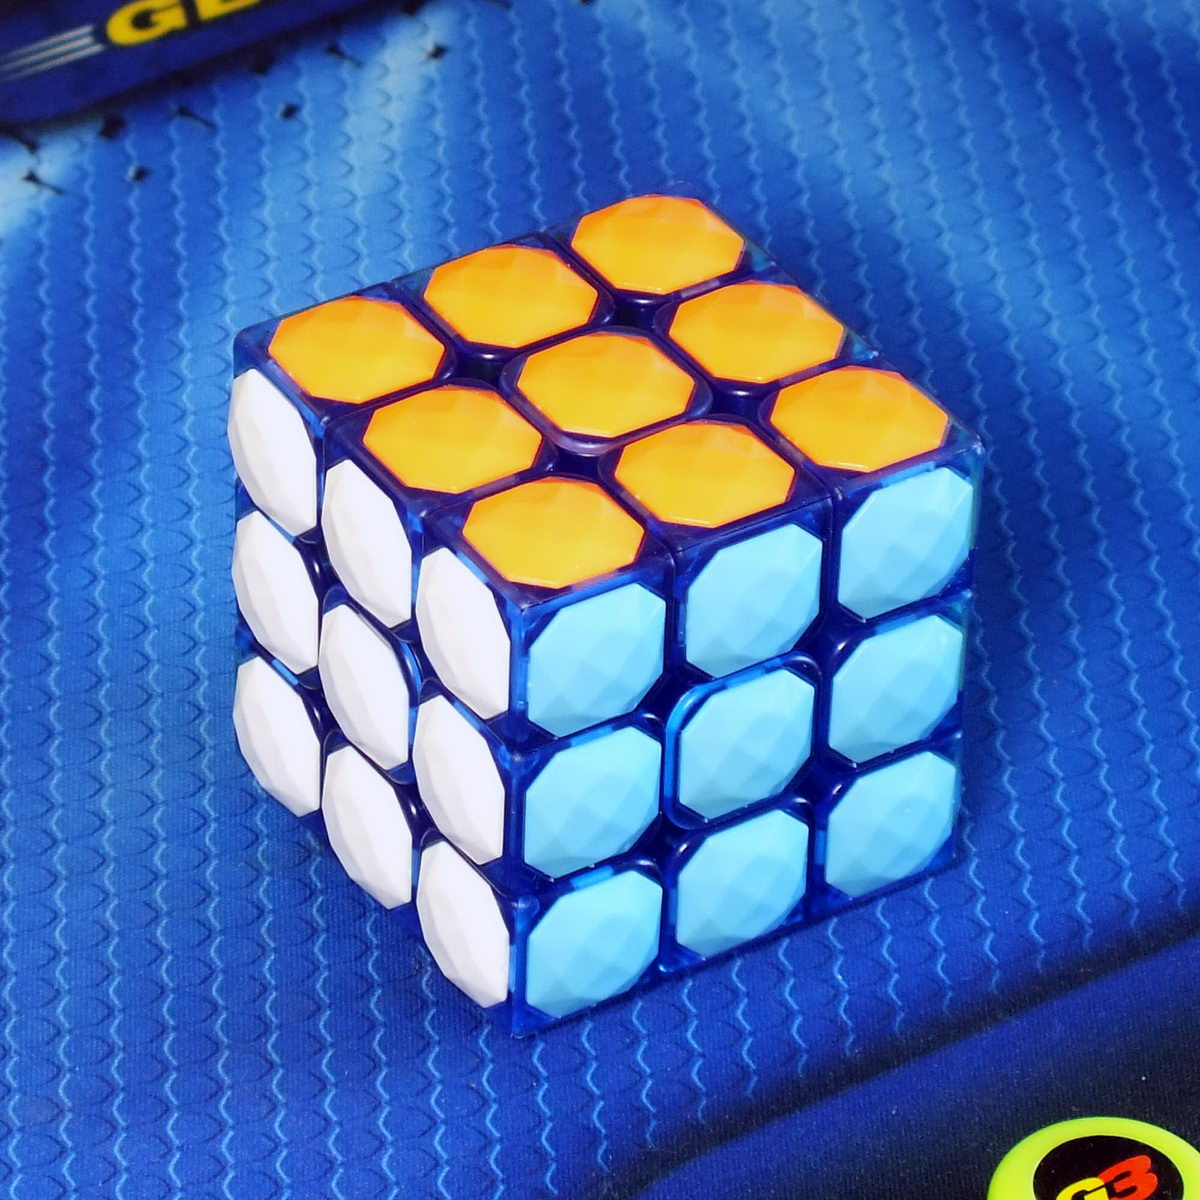 Moyu Diamond cube 3x3 transparent blue